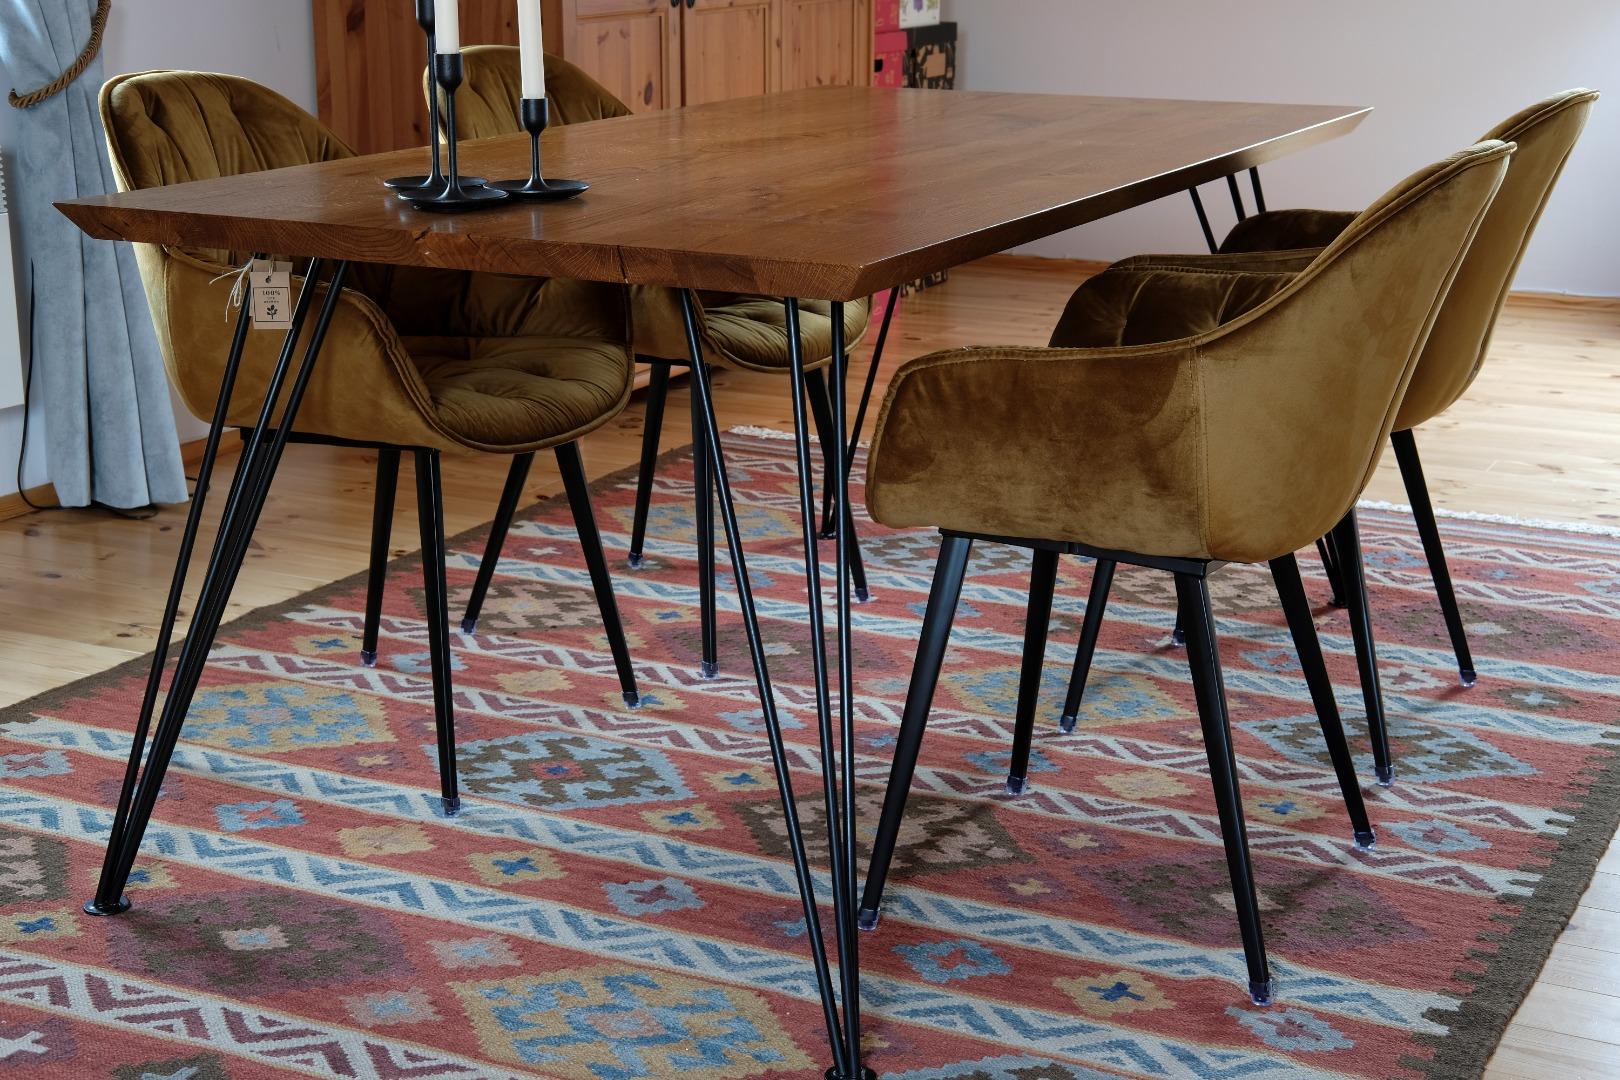 Stół na nodze Hairpin legs #2